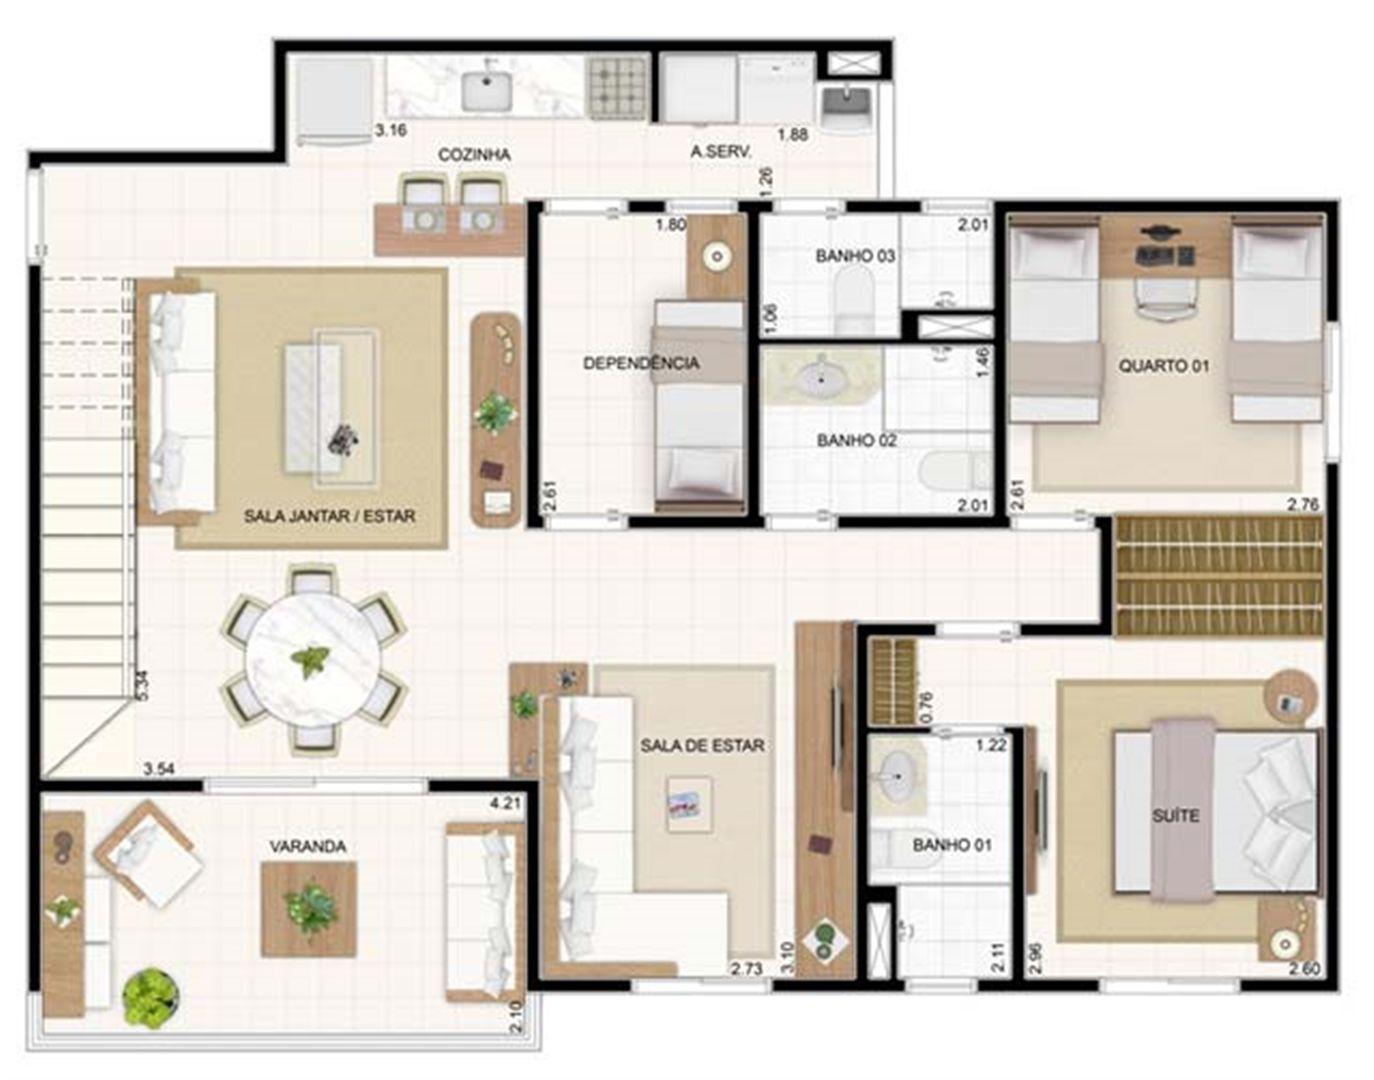 Duplex Inferior Sala Ampliada 3 dorms 176,57m²   Vita 2 Residencial Clube – Apartamento no  Pitimbu - Natal - Rio Grande do Norte